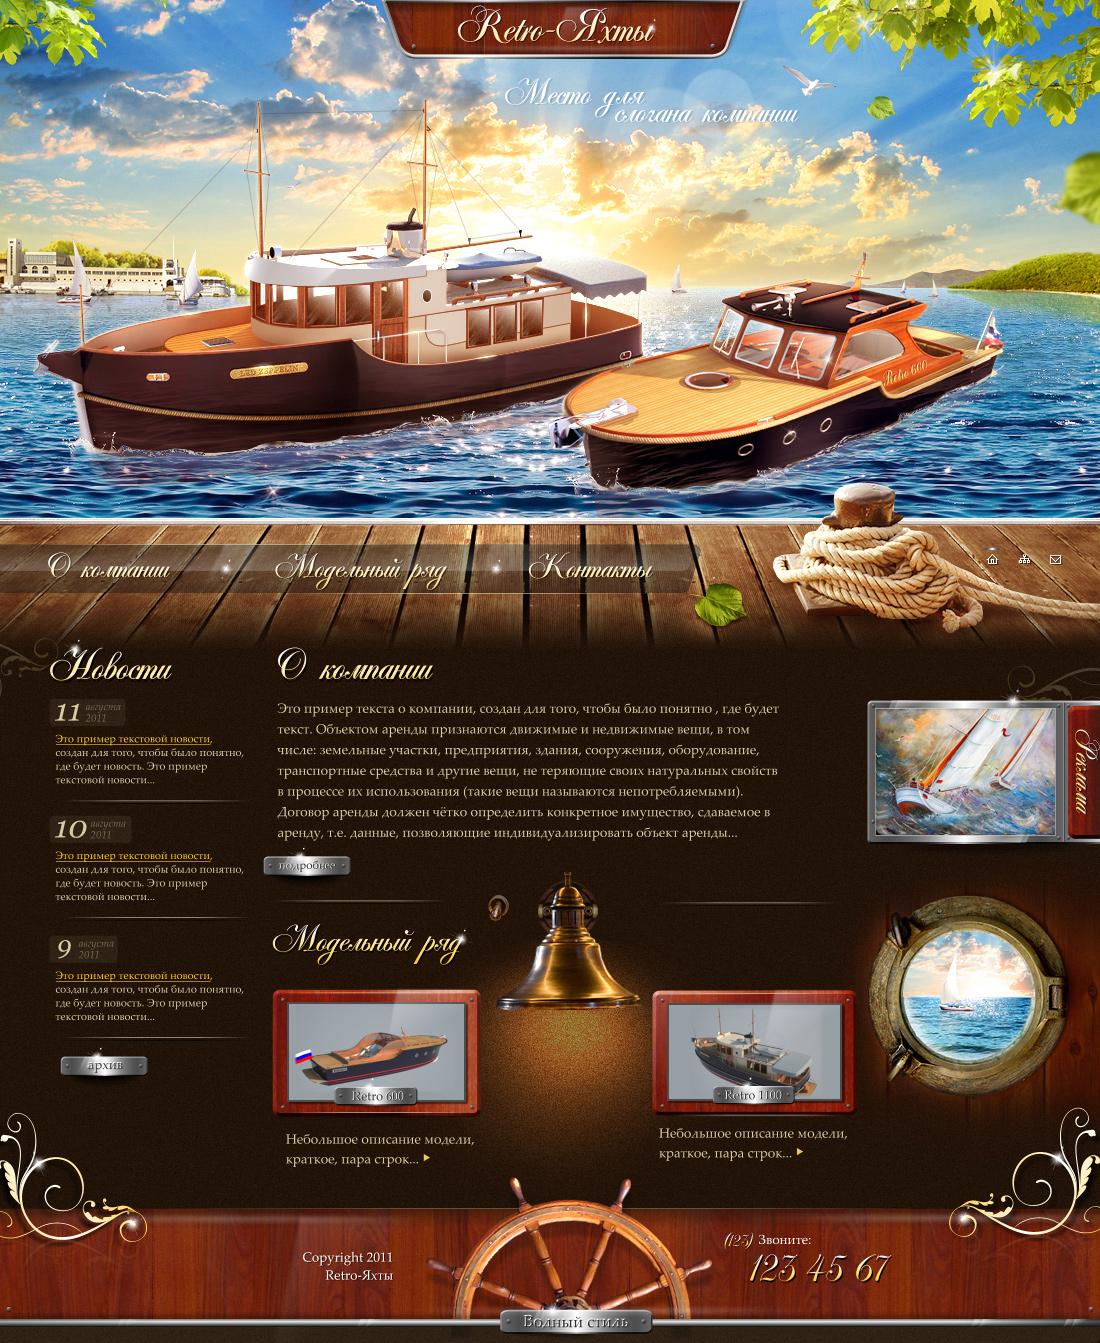 Ретро-яхты